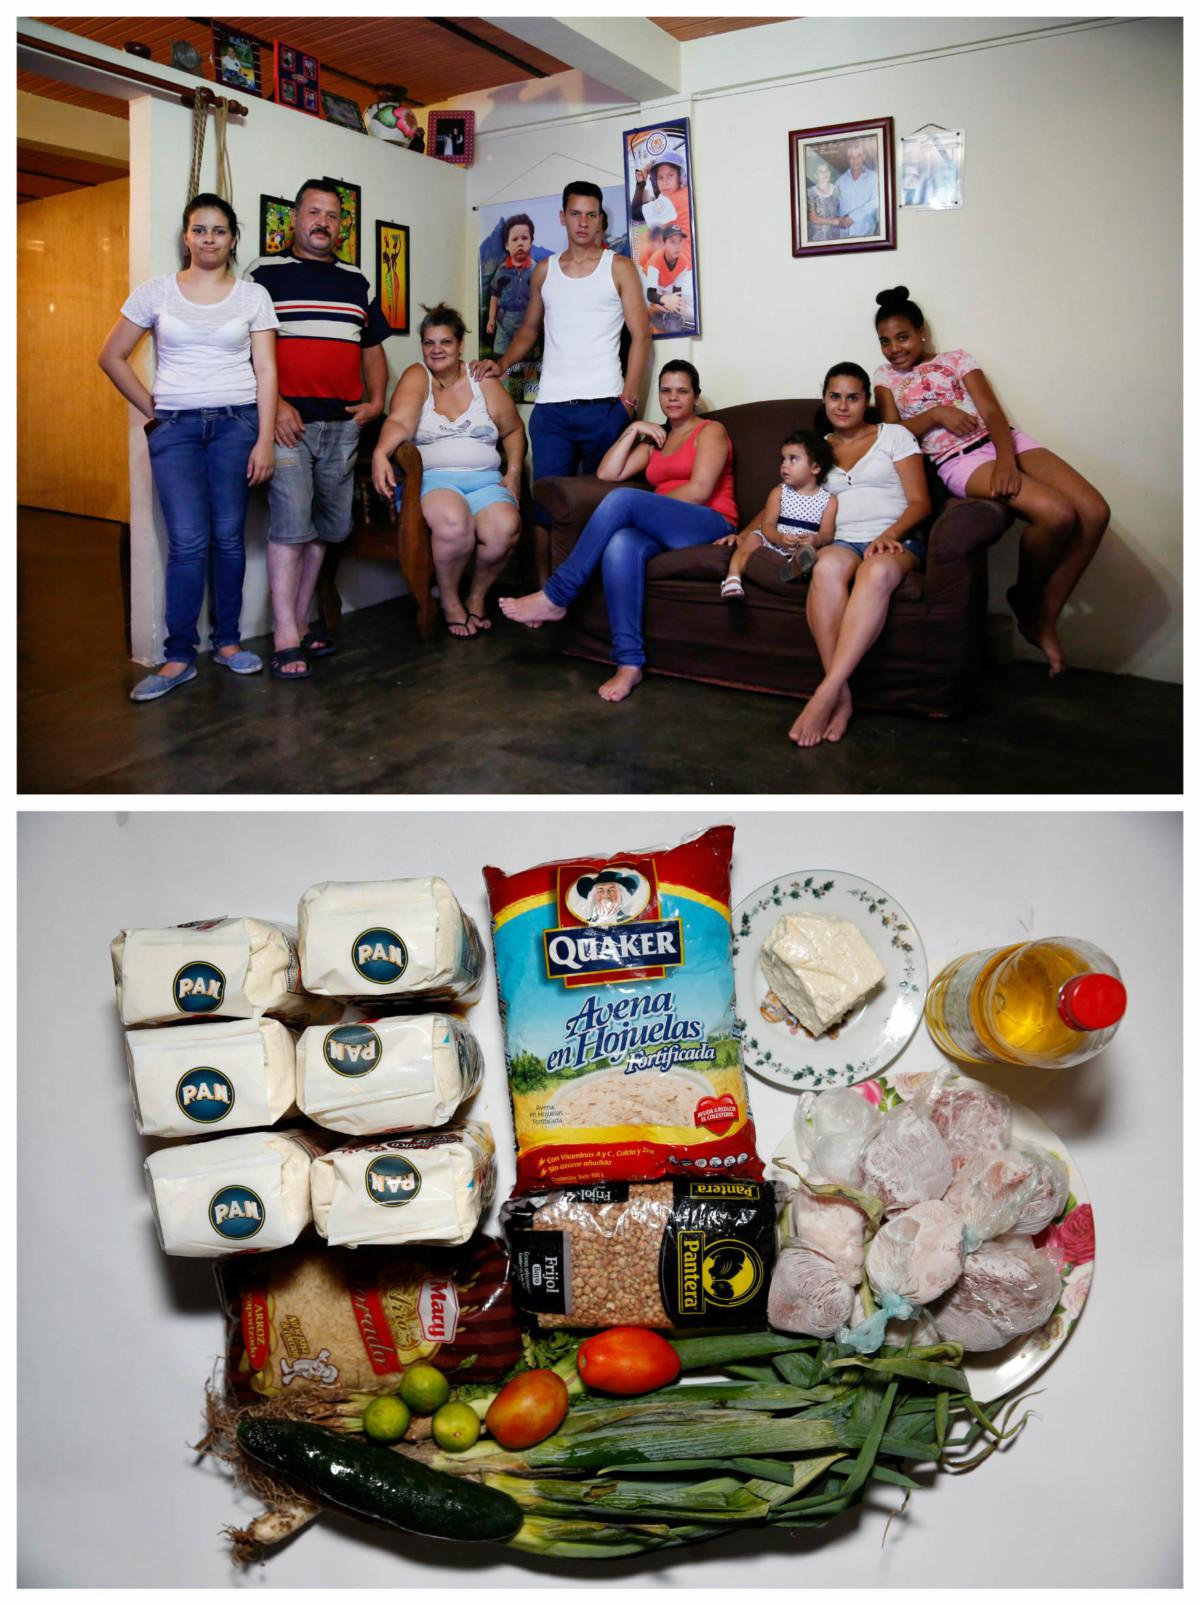 Ricardo Mendez 一家:「我們是大家族,愈來愈難維生。」